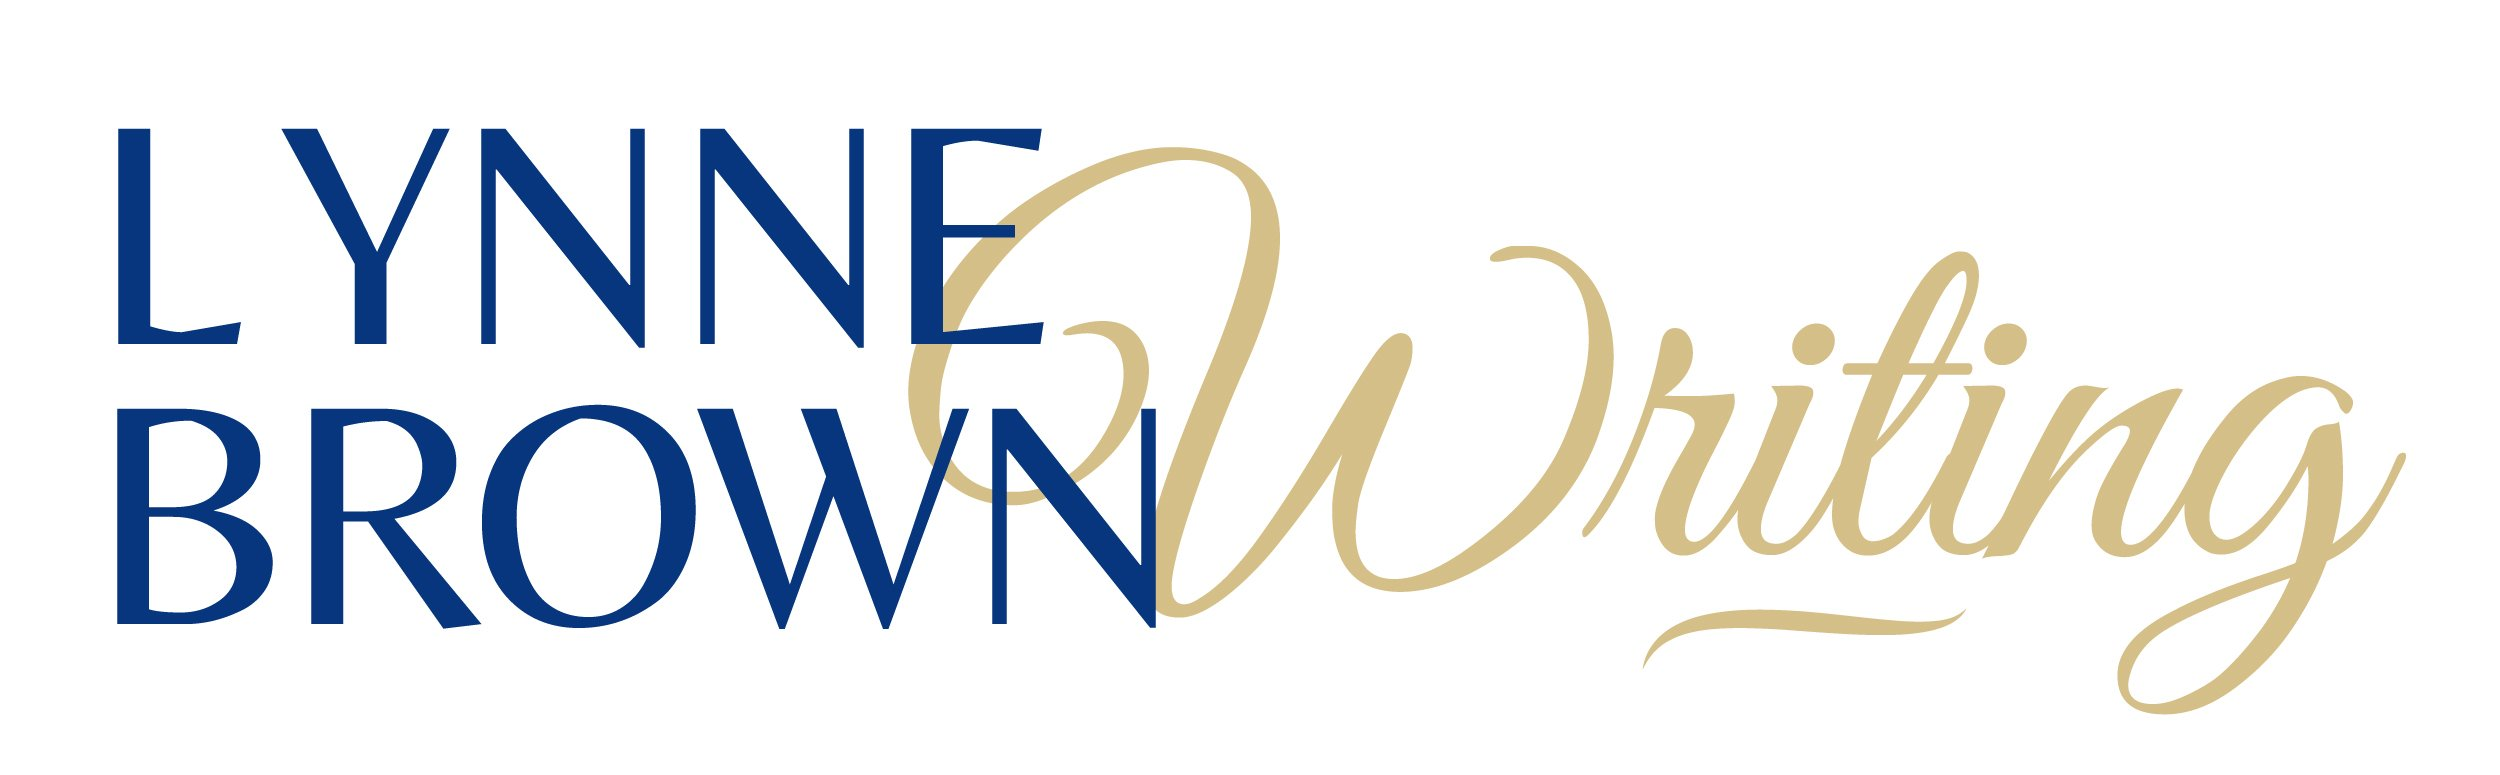 Lynne Brown Writing Logo copy 6 - LRG_sd hsdb d